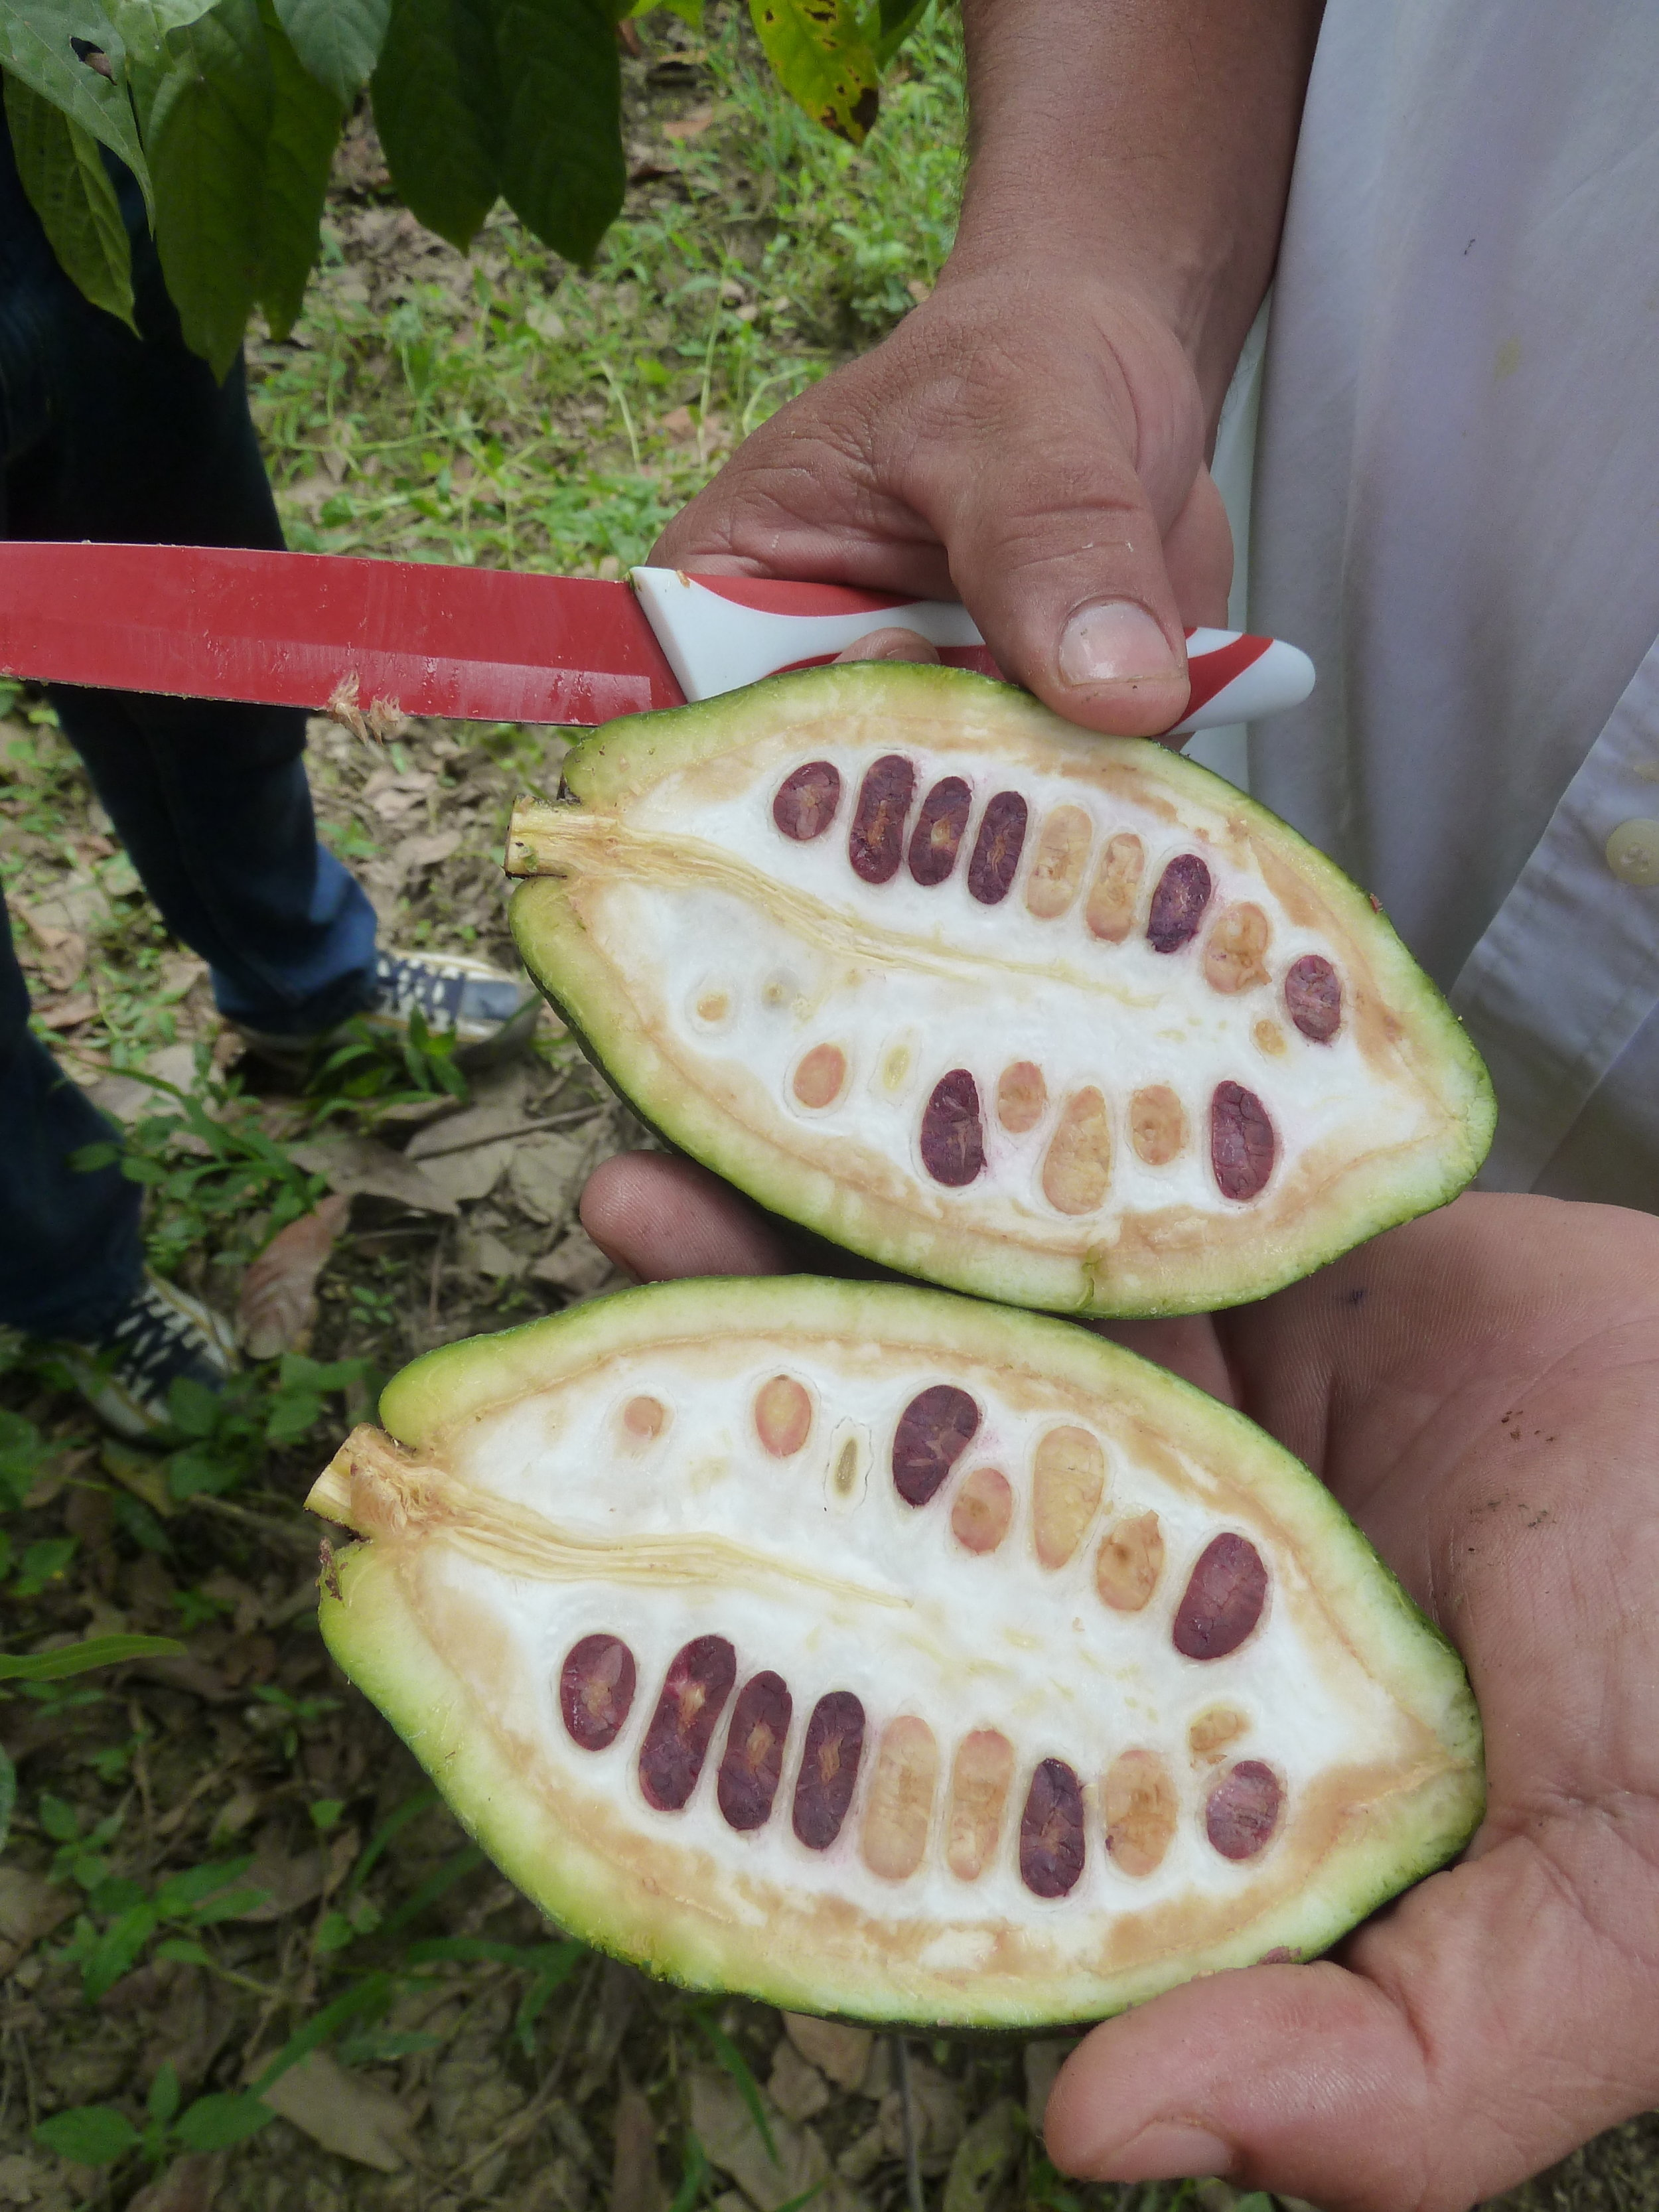 Garcoa Peru Chulucanas Kakao Porcelana.JPG